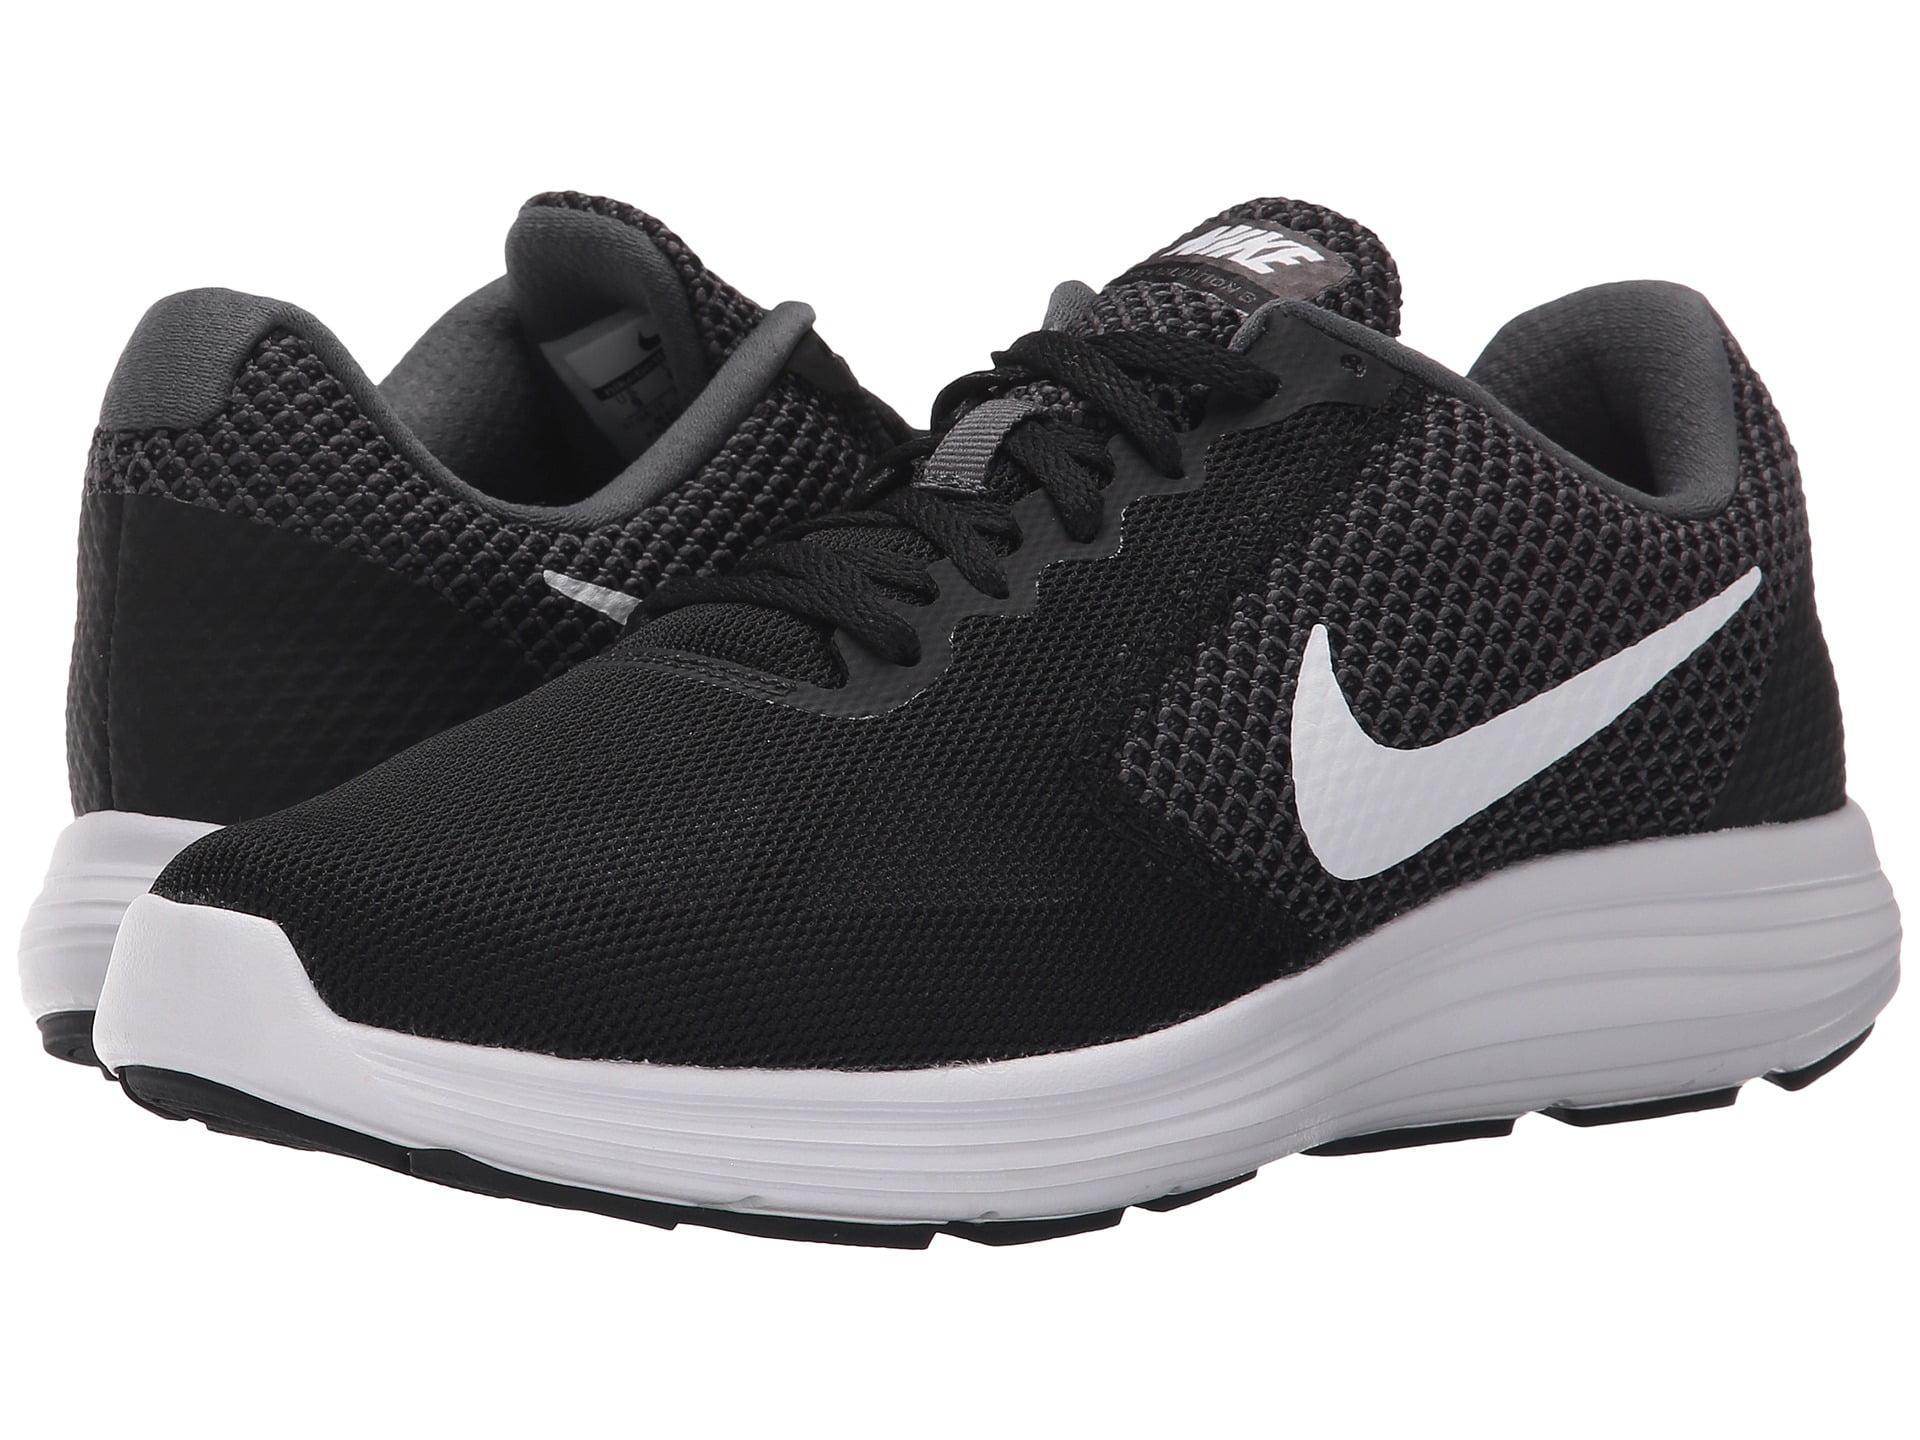 Nike REVOLUTION 3 Womens Black White Dark Grey Athletic Lace Up ... 53399798574d